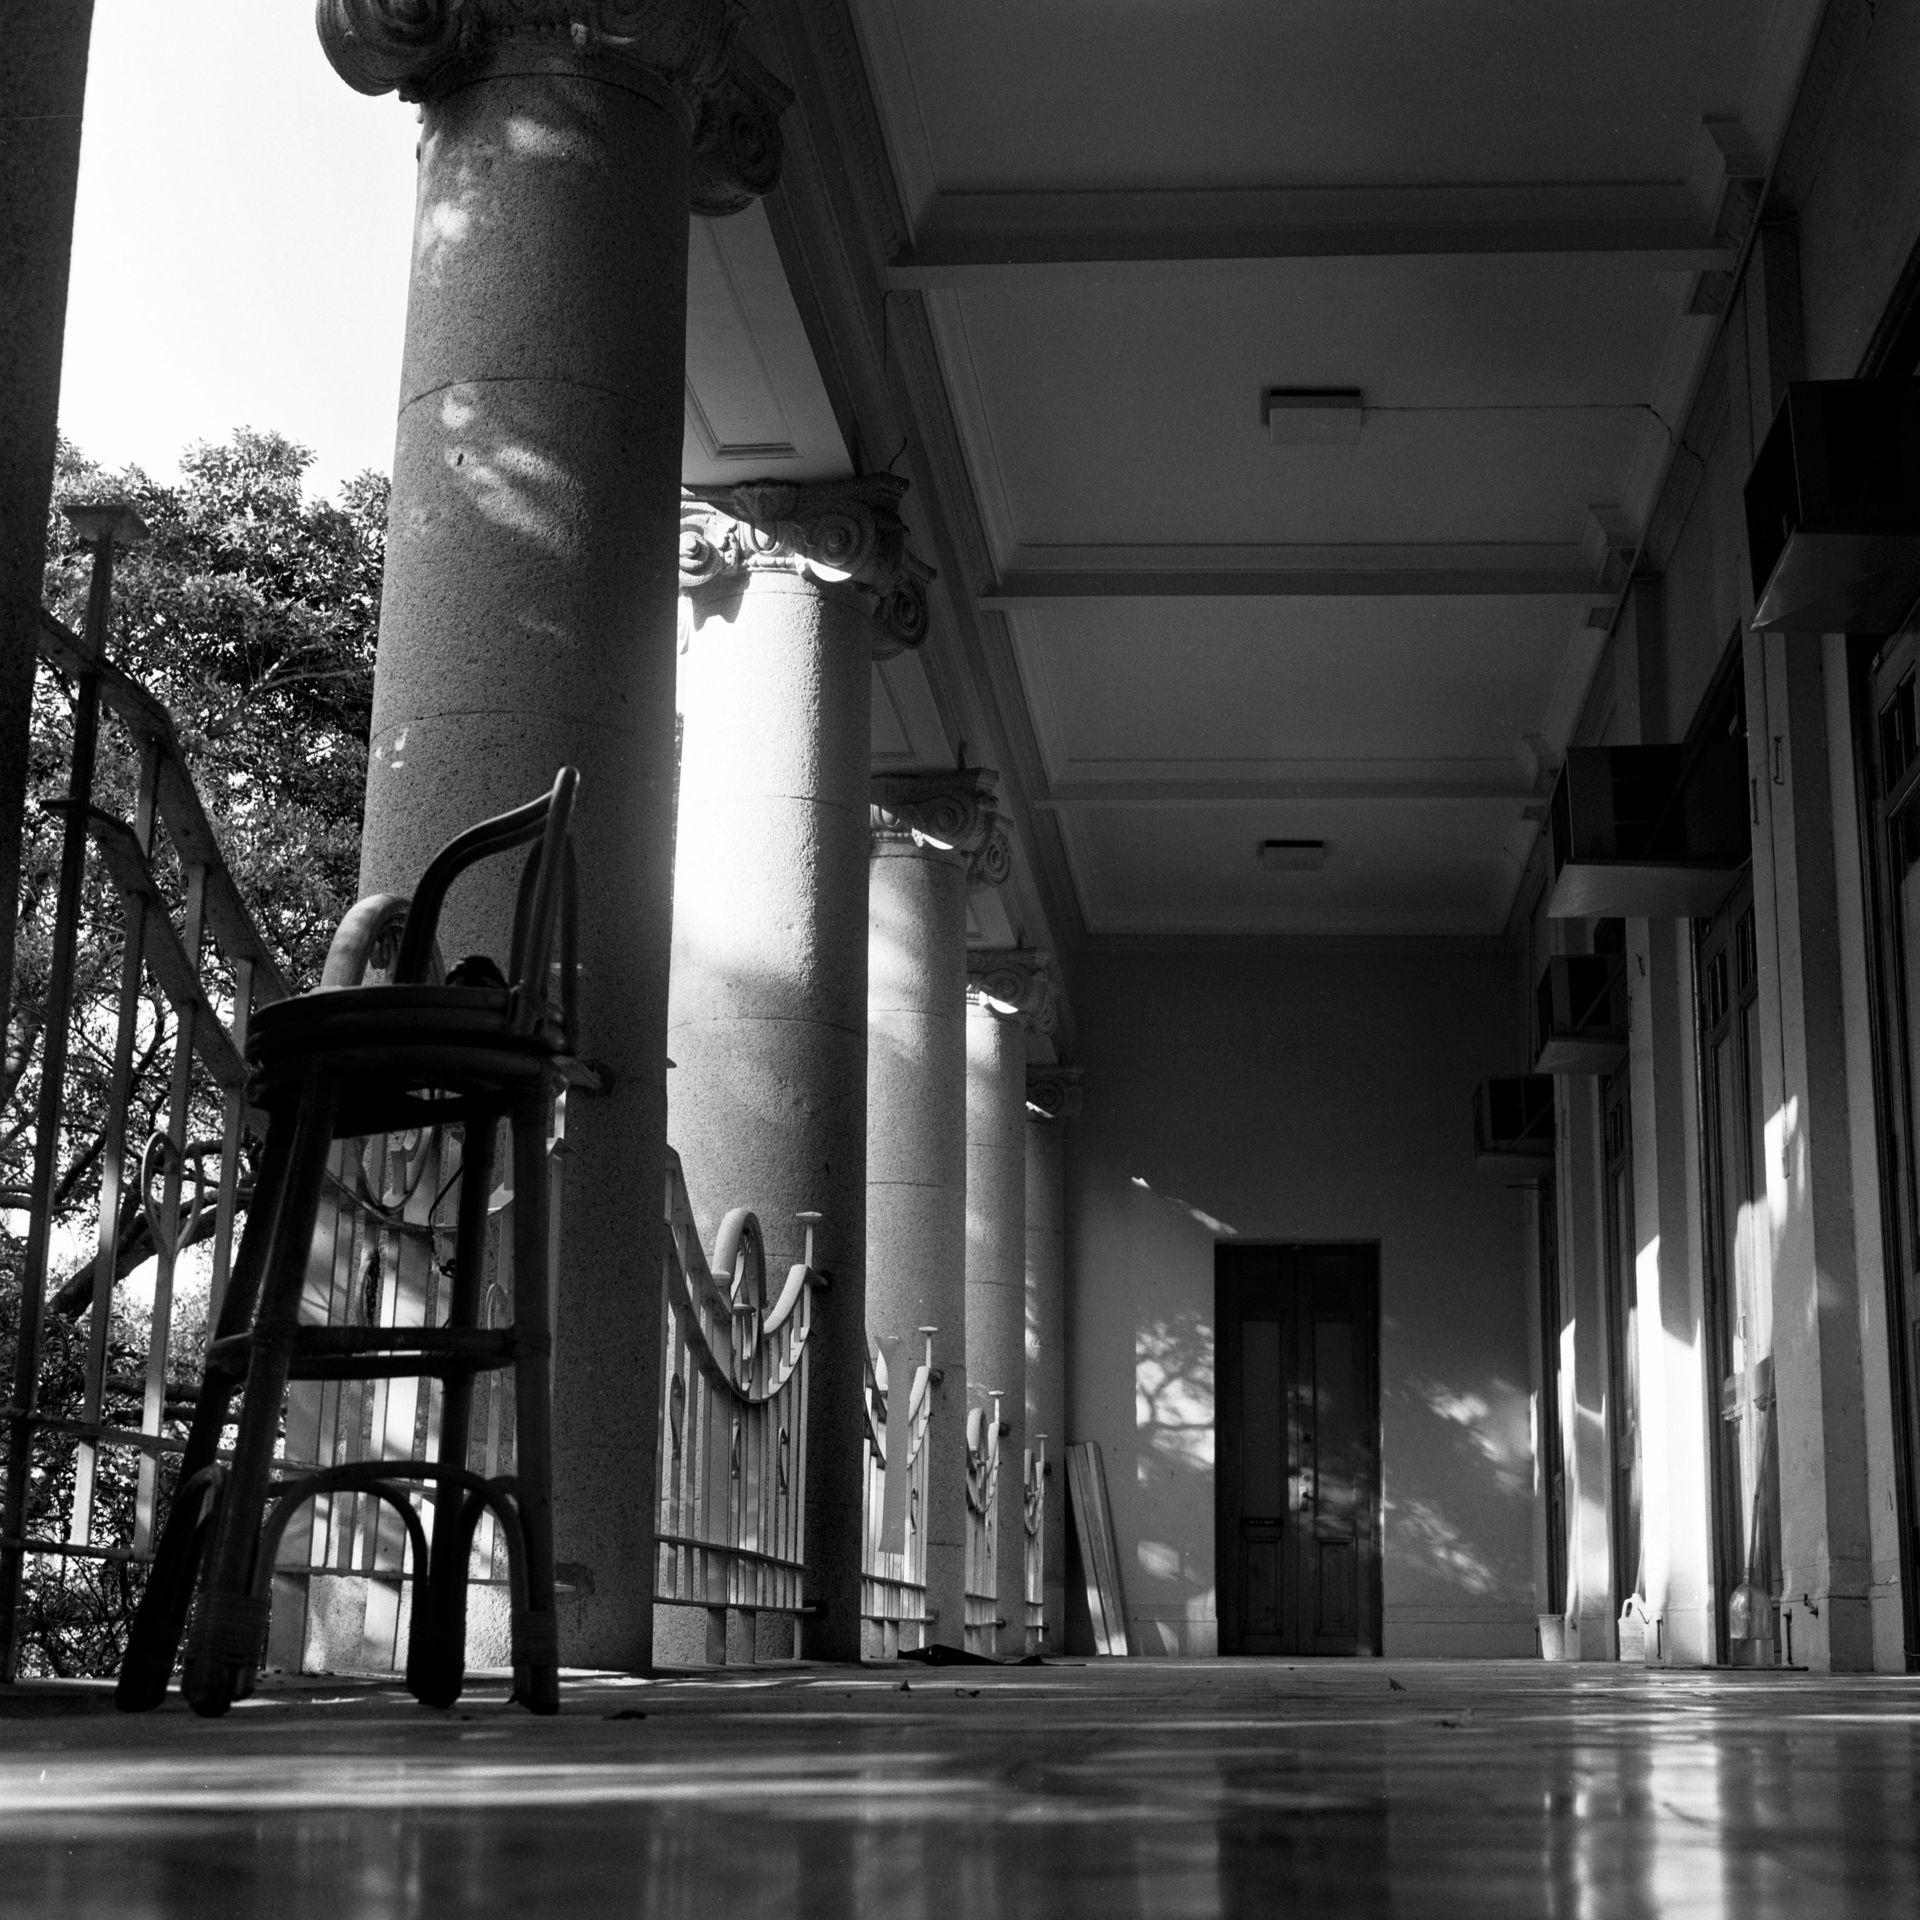 Luk Yau Tong #8, Hong Kong University Main Building, 1988